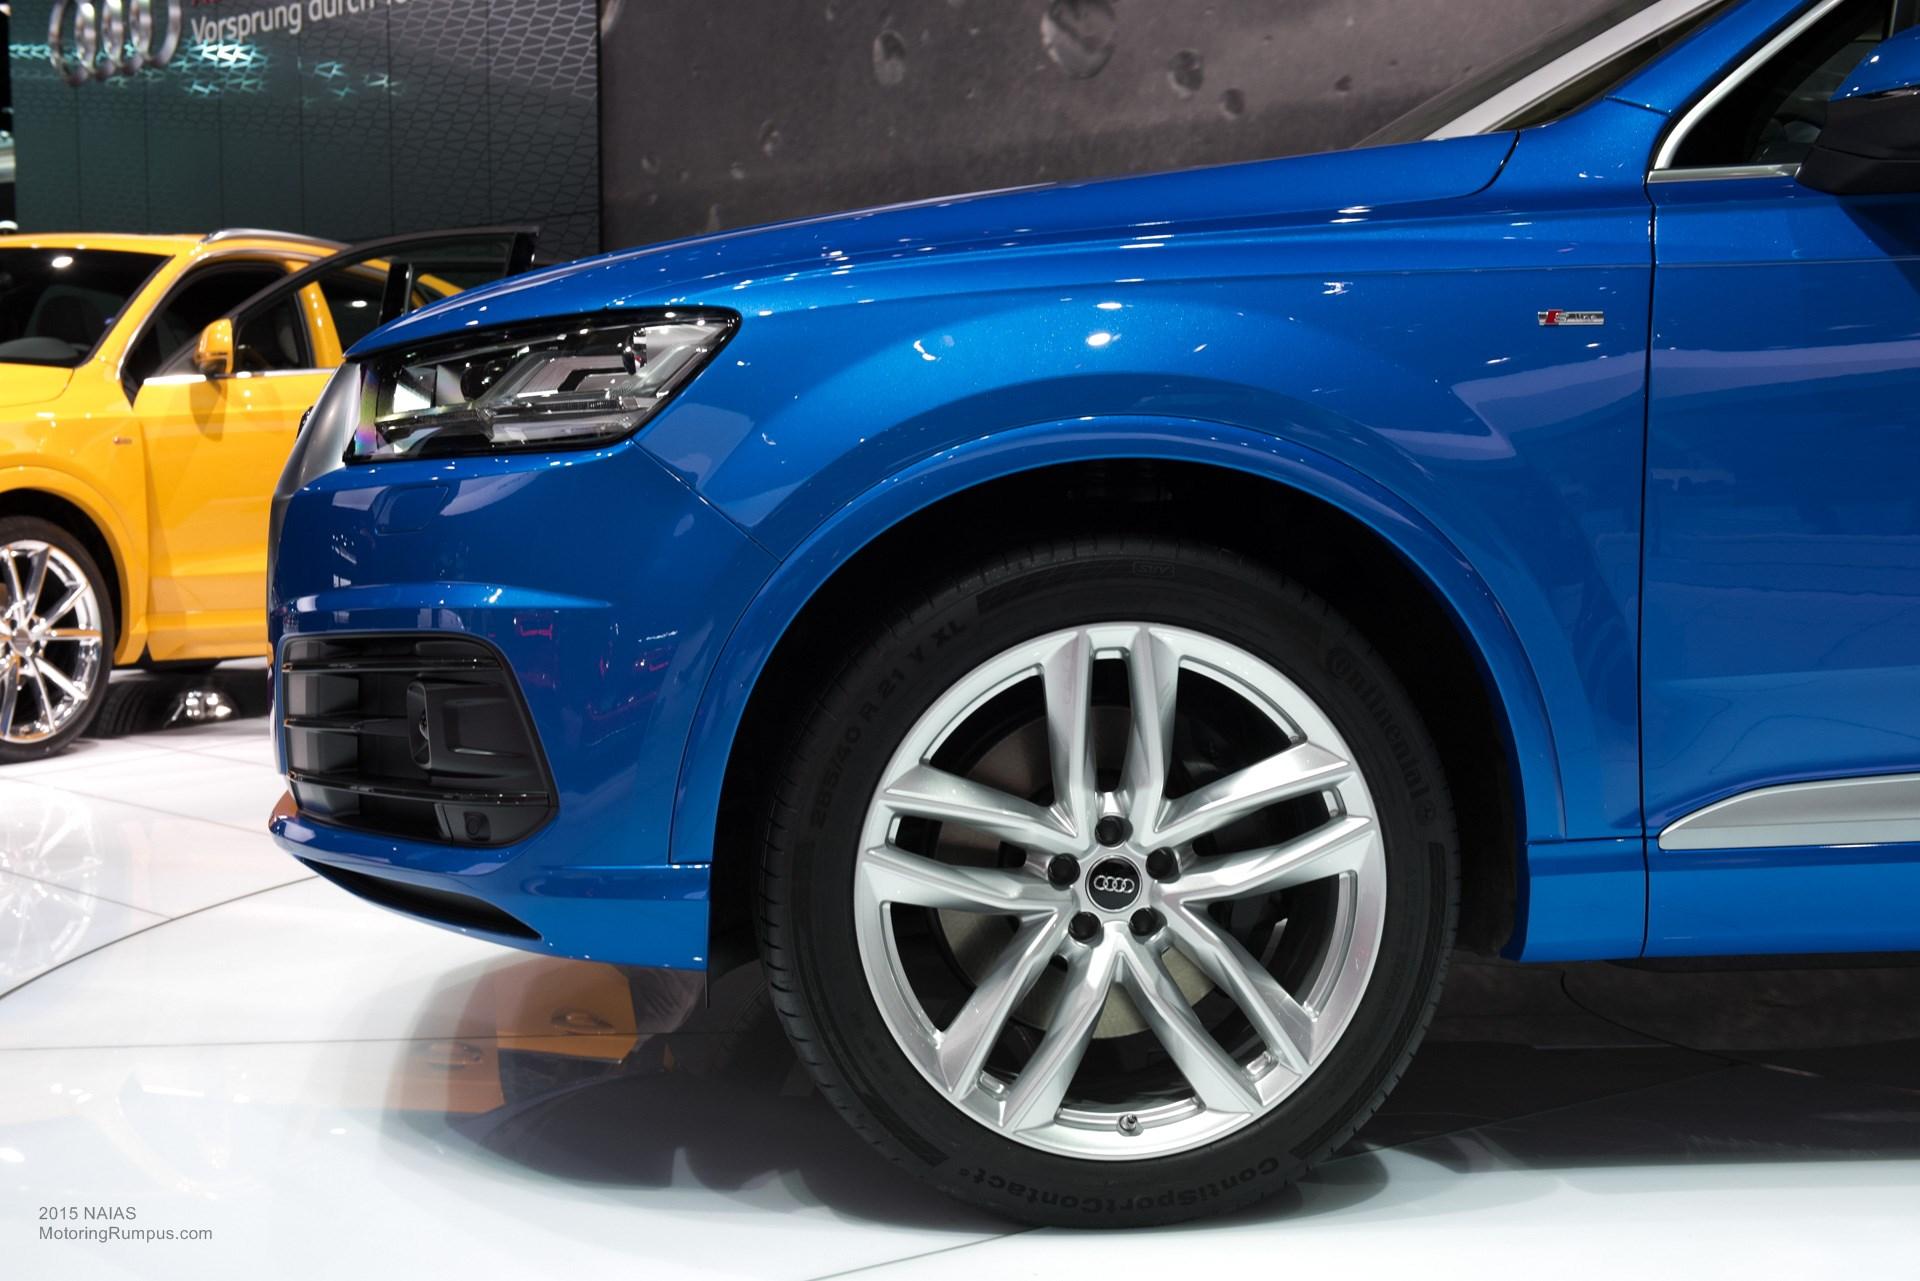 2015 Chevy Camero 2015 NAIAS Audi Q7 21-inch Wheels - Motoring Rumpus